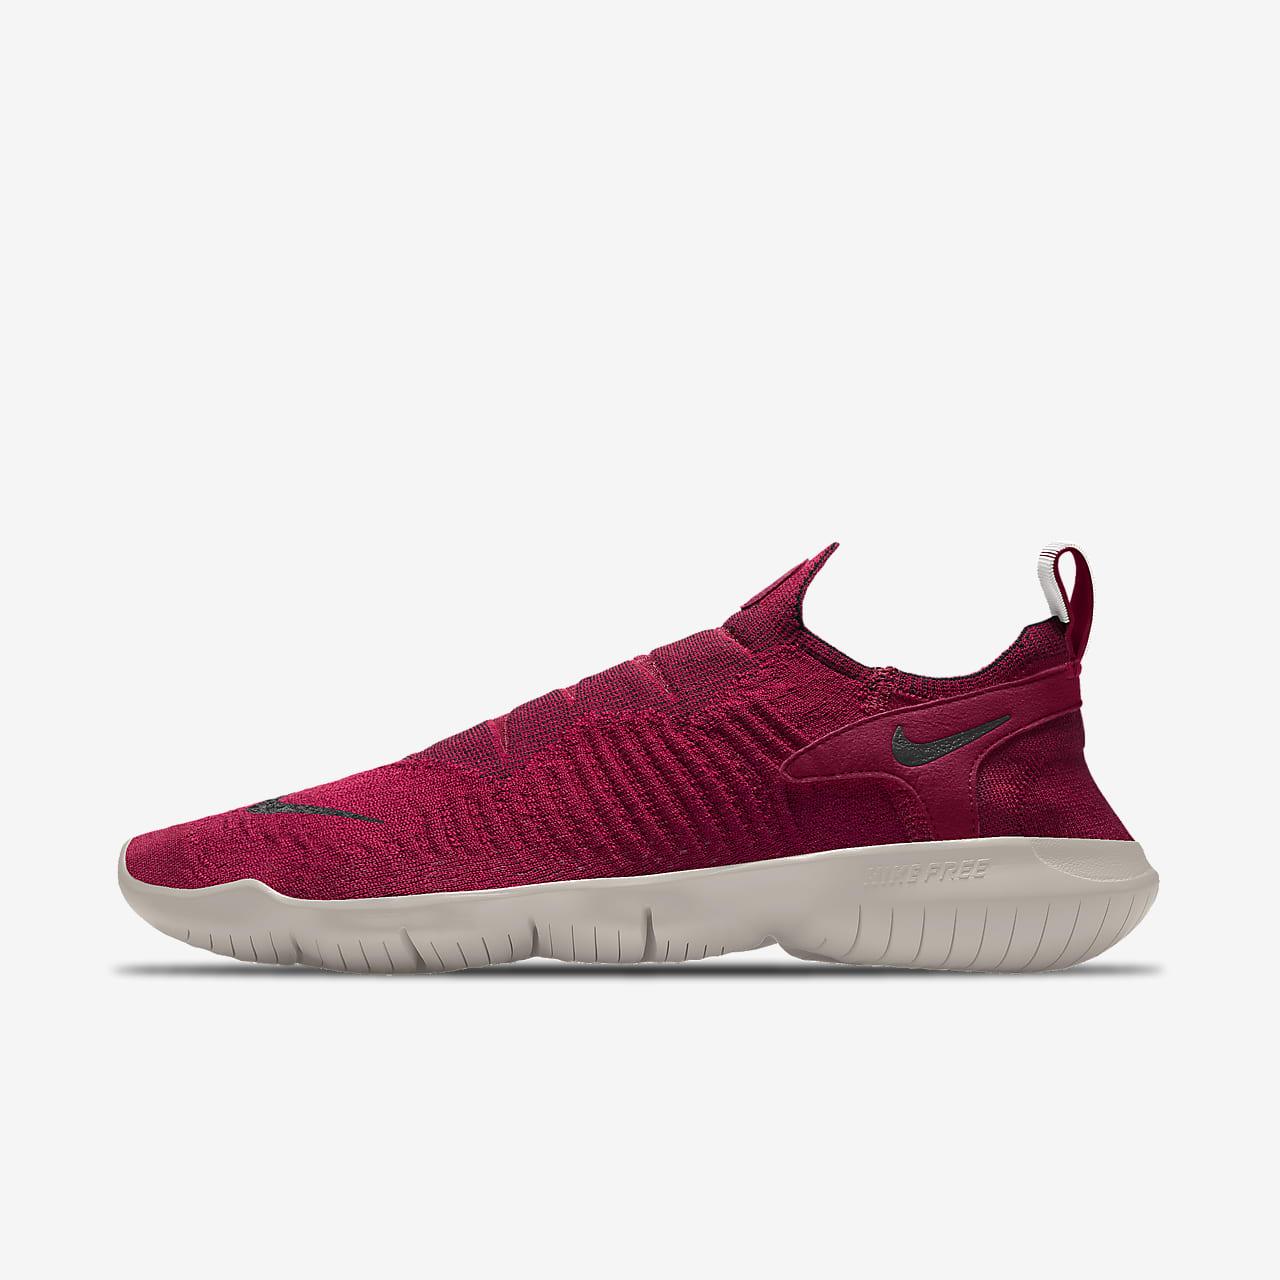 Nike Free RN Flyknit 3.0 By You Custom 女子跑步鞋